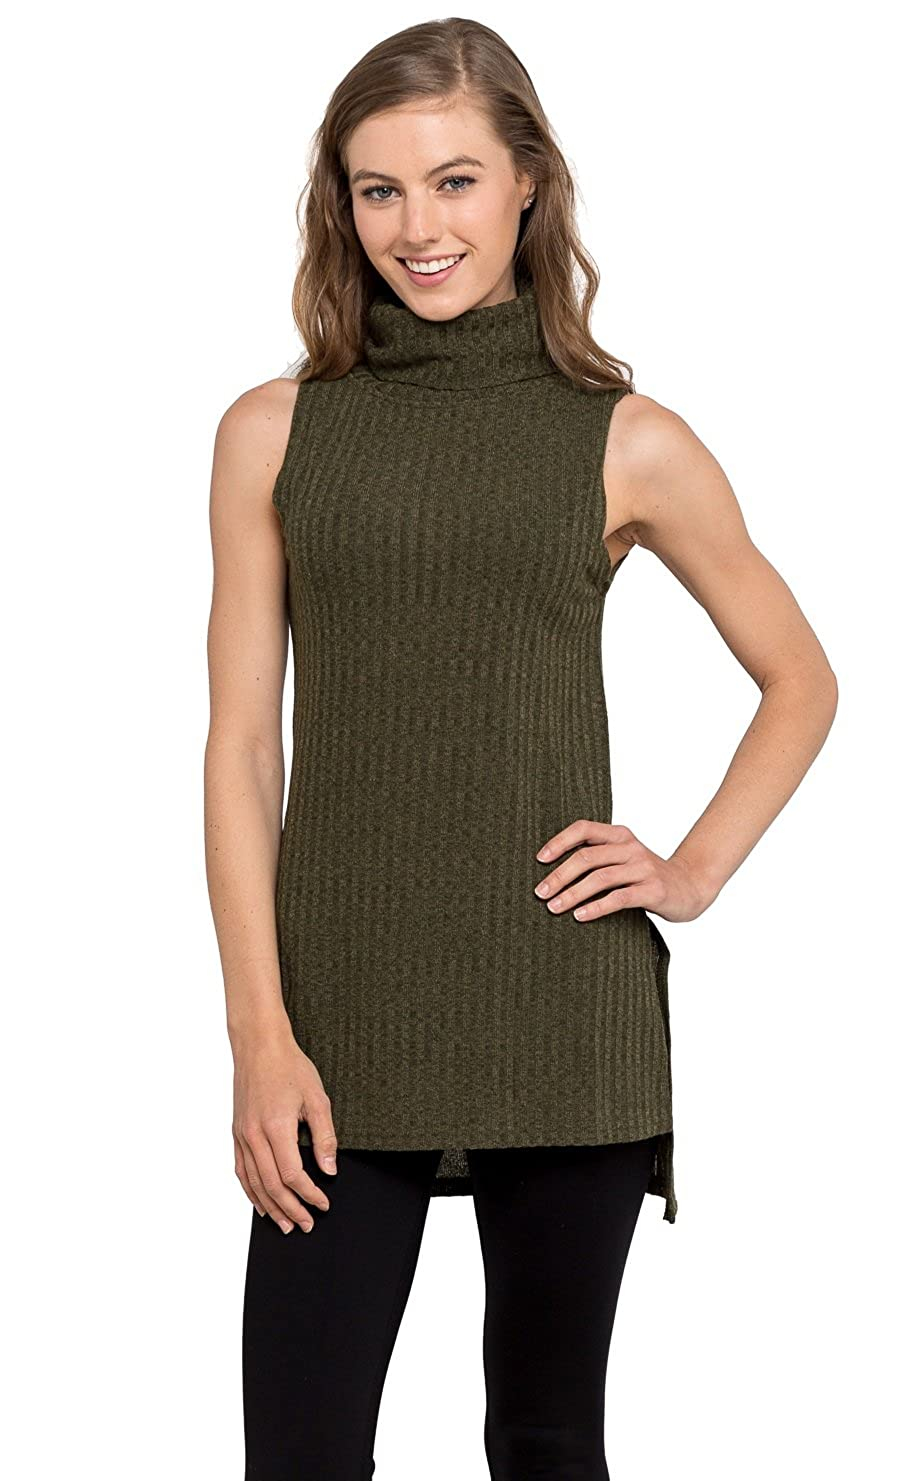 3e53eaf40c7 Velucci Womens Turtleneck Tunic Tank Top - Sleeveless Ribbed Sweater at  Amazon Women's Clothing store: